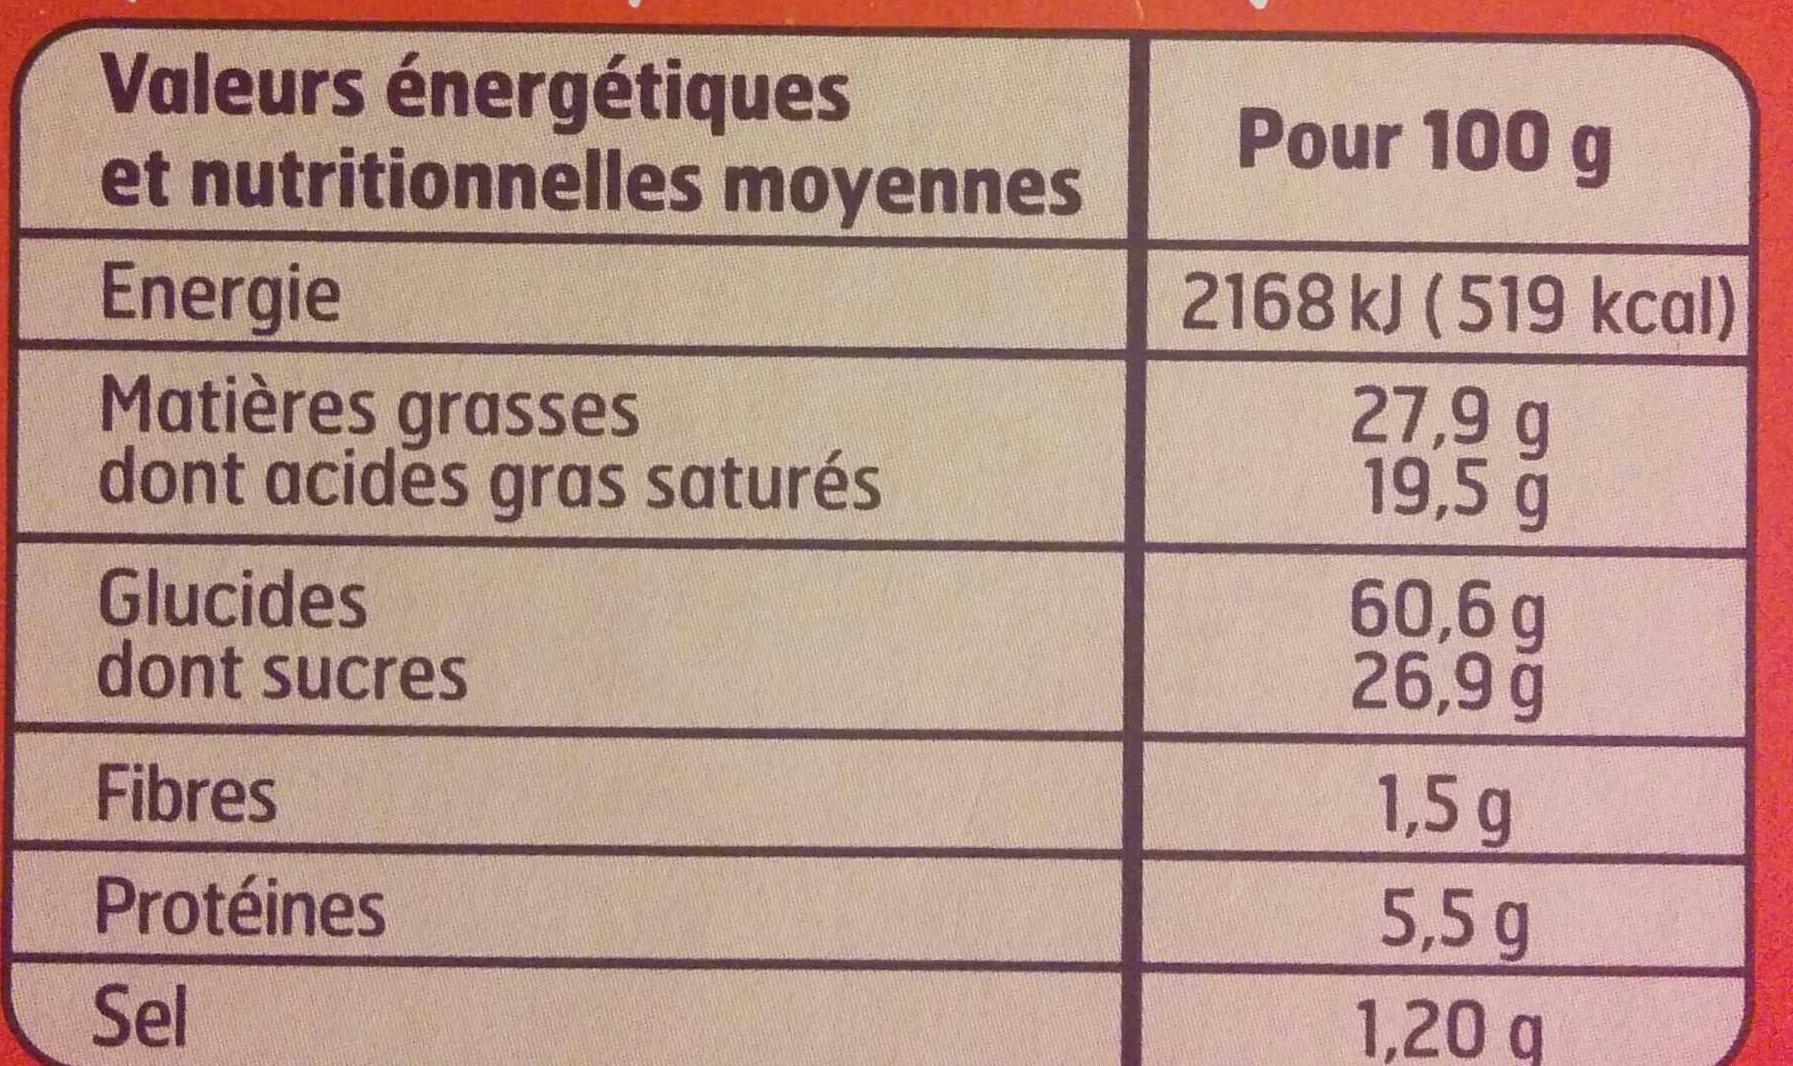 Palets bretons - Nutrition facts - fr